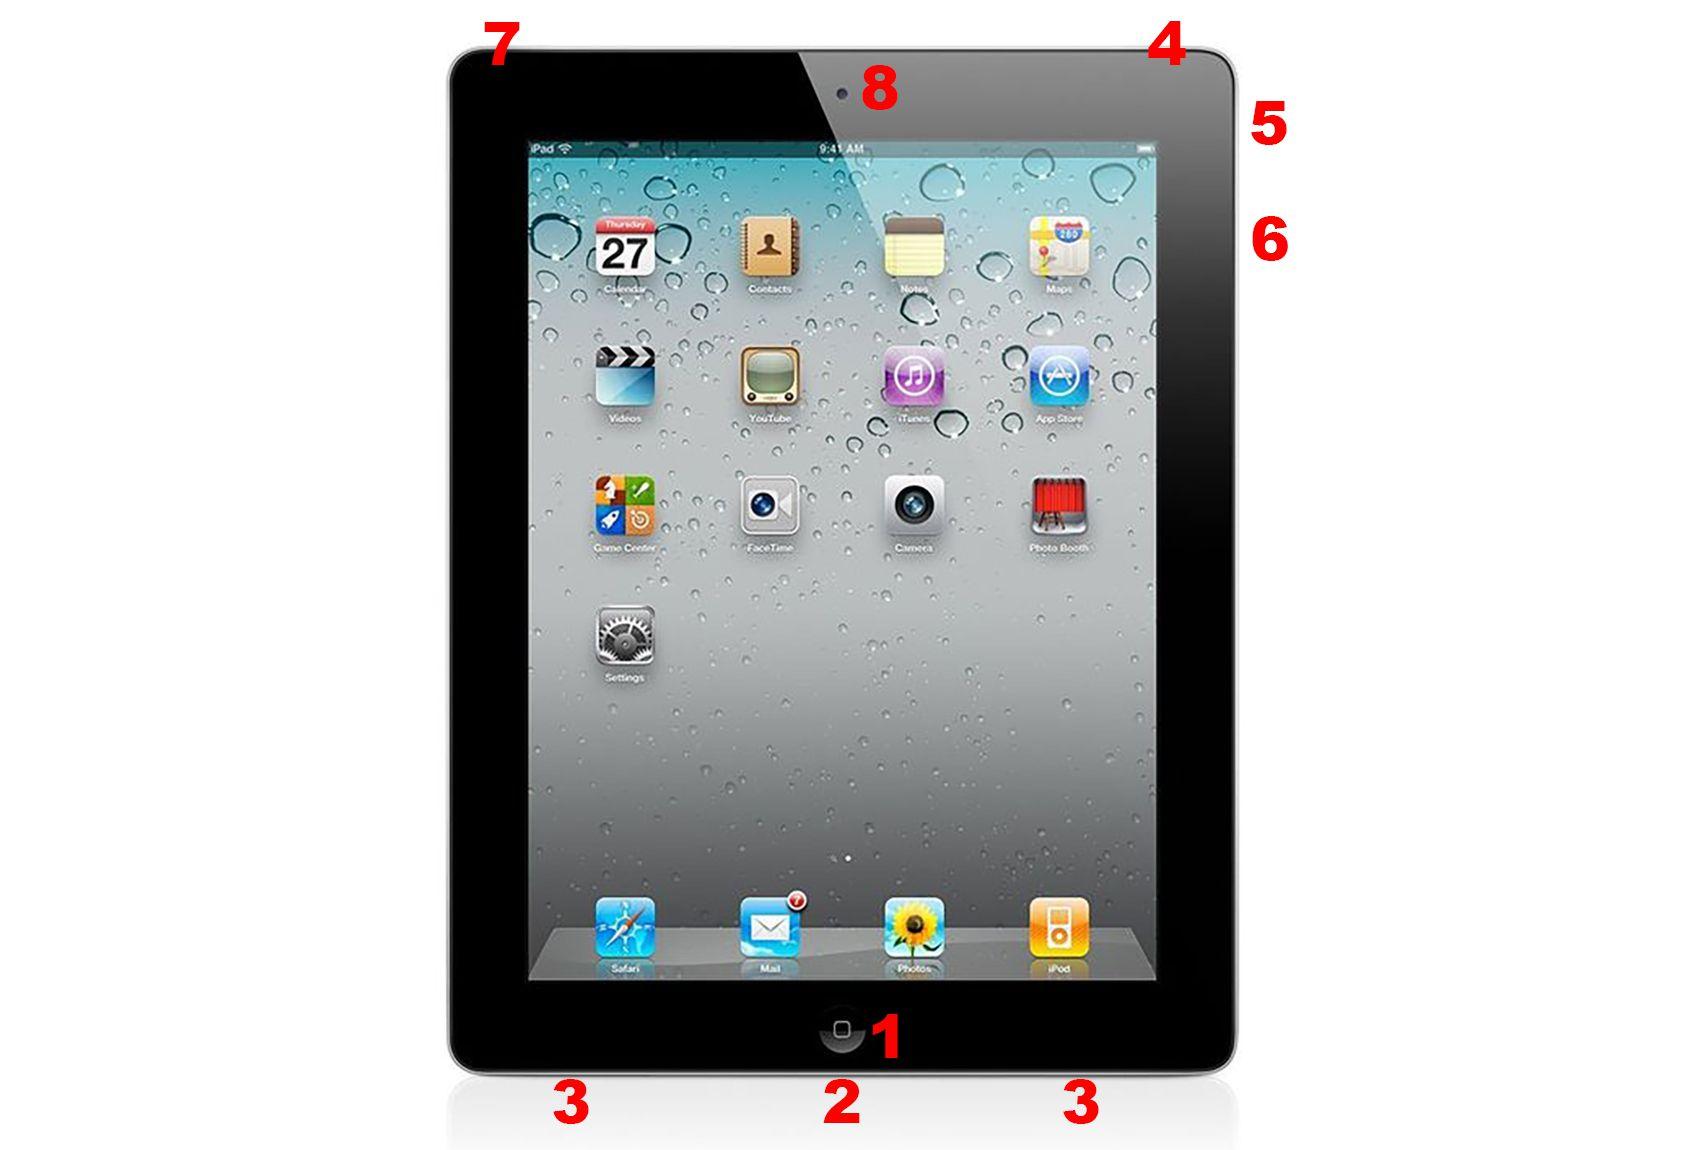 Anatomy of the Apple iPad 2 Hardware Features